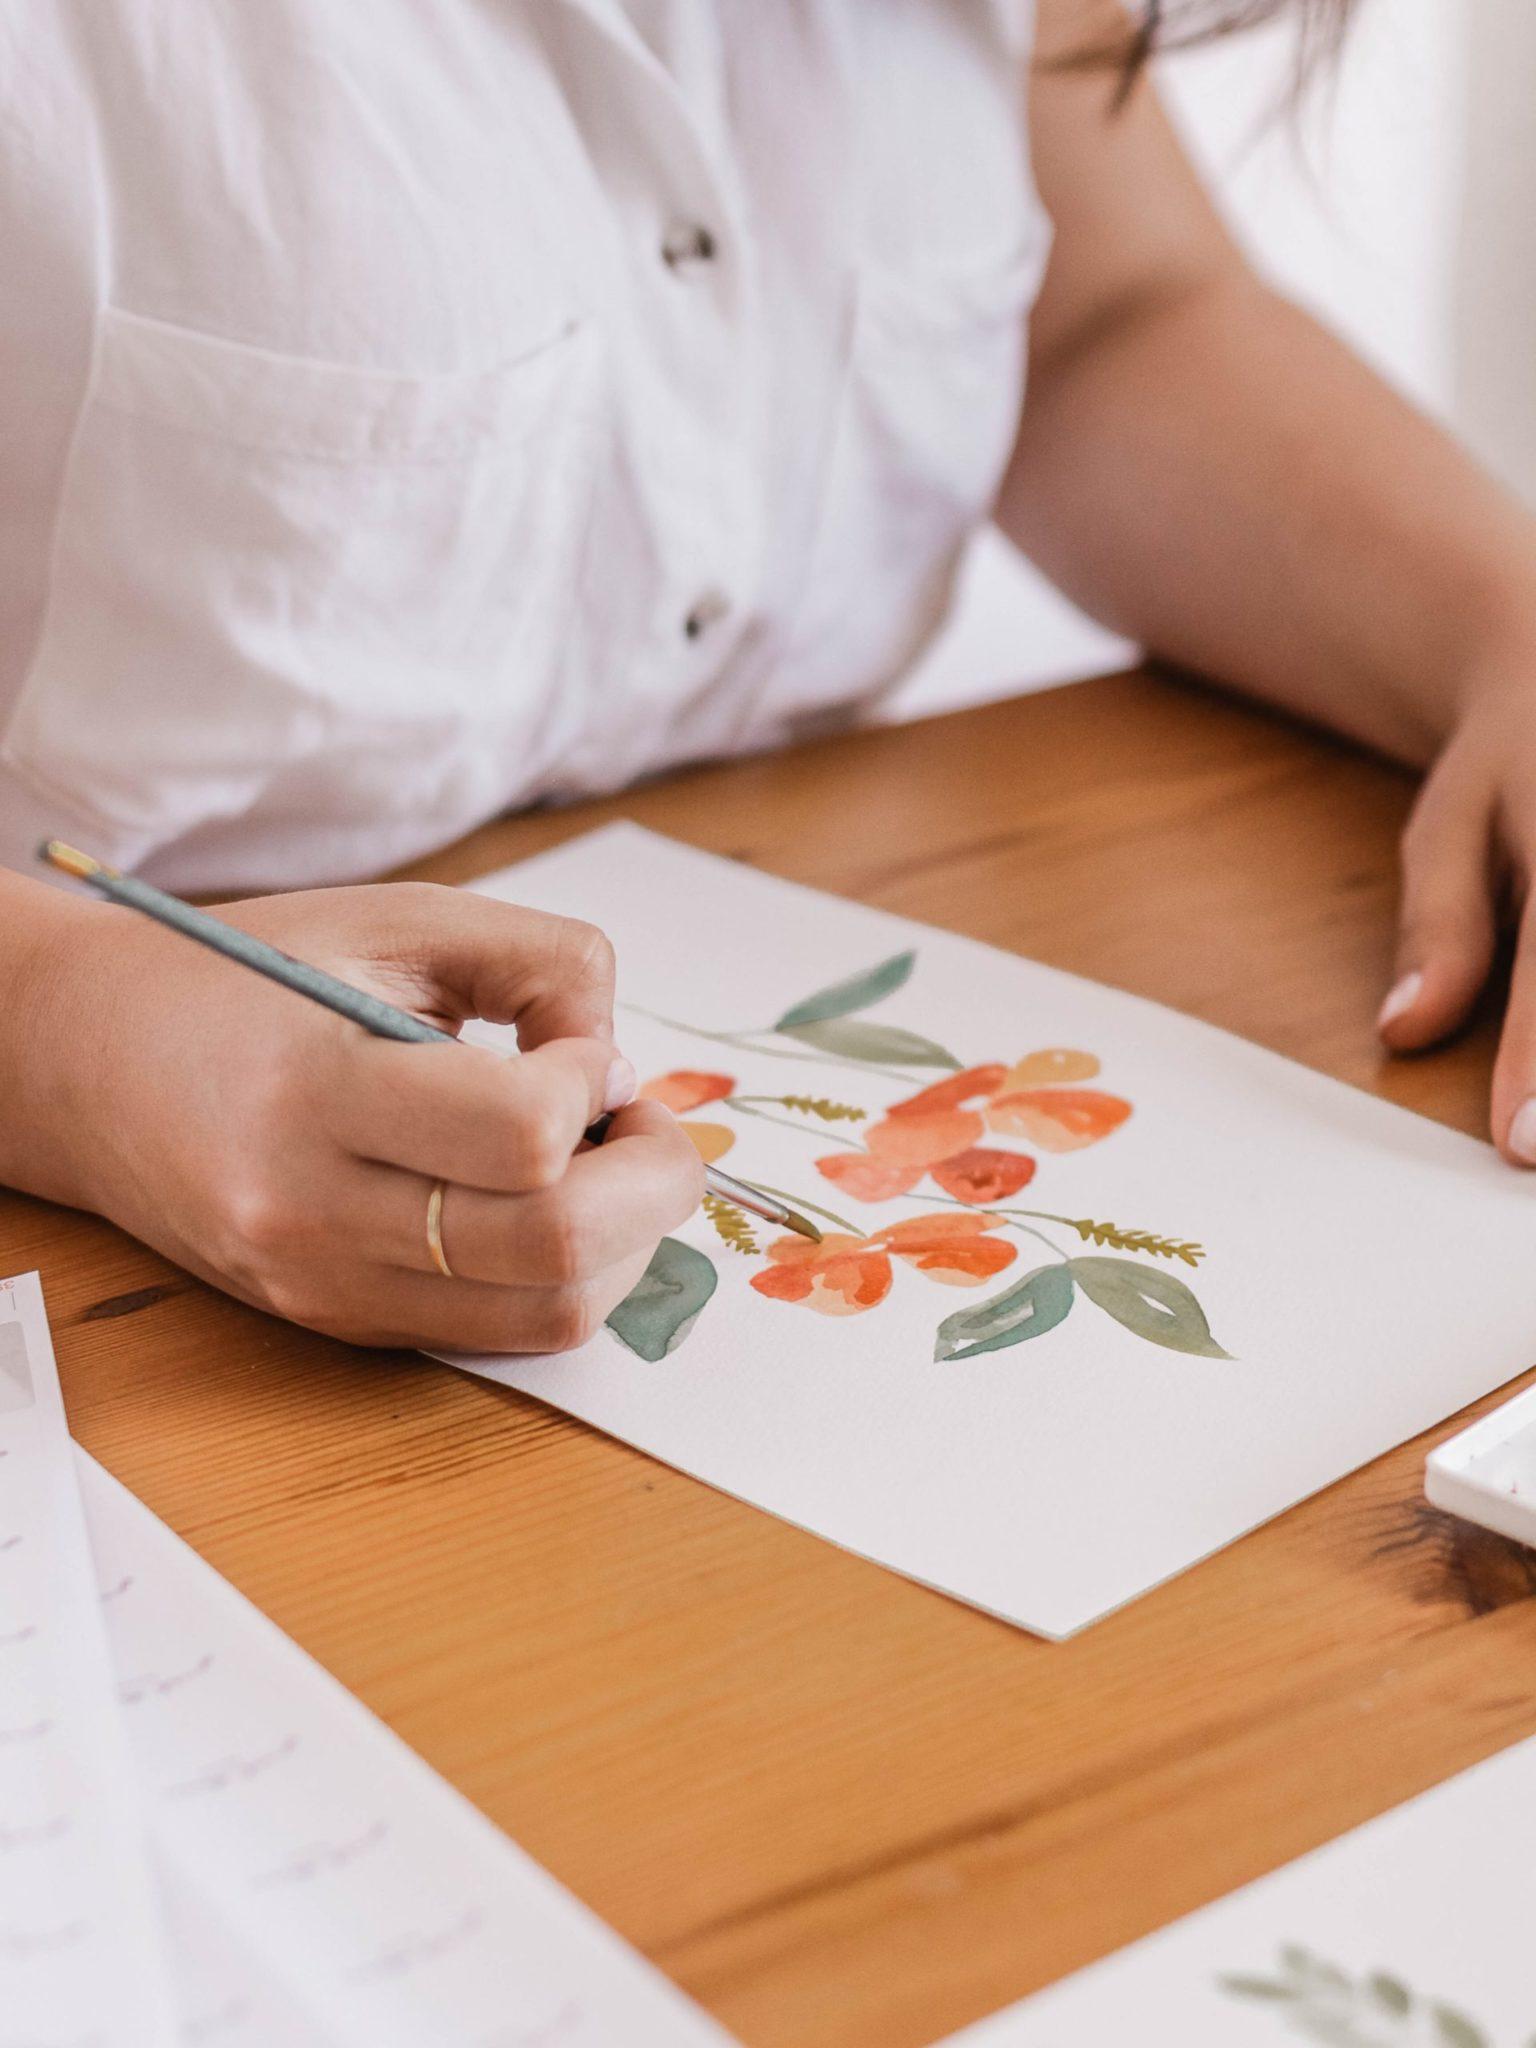 deGranero dibujando flores